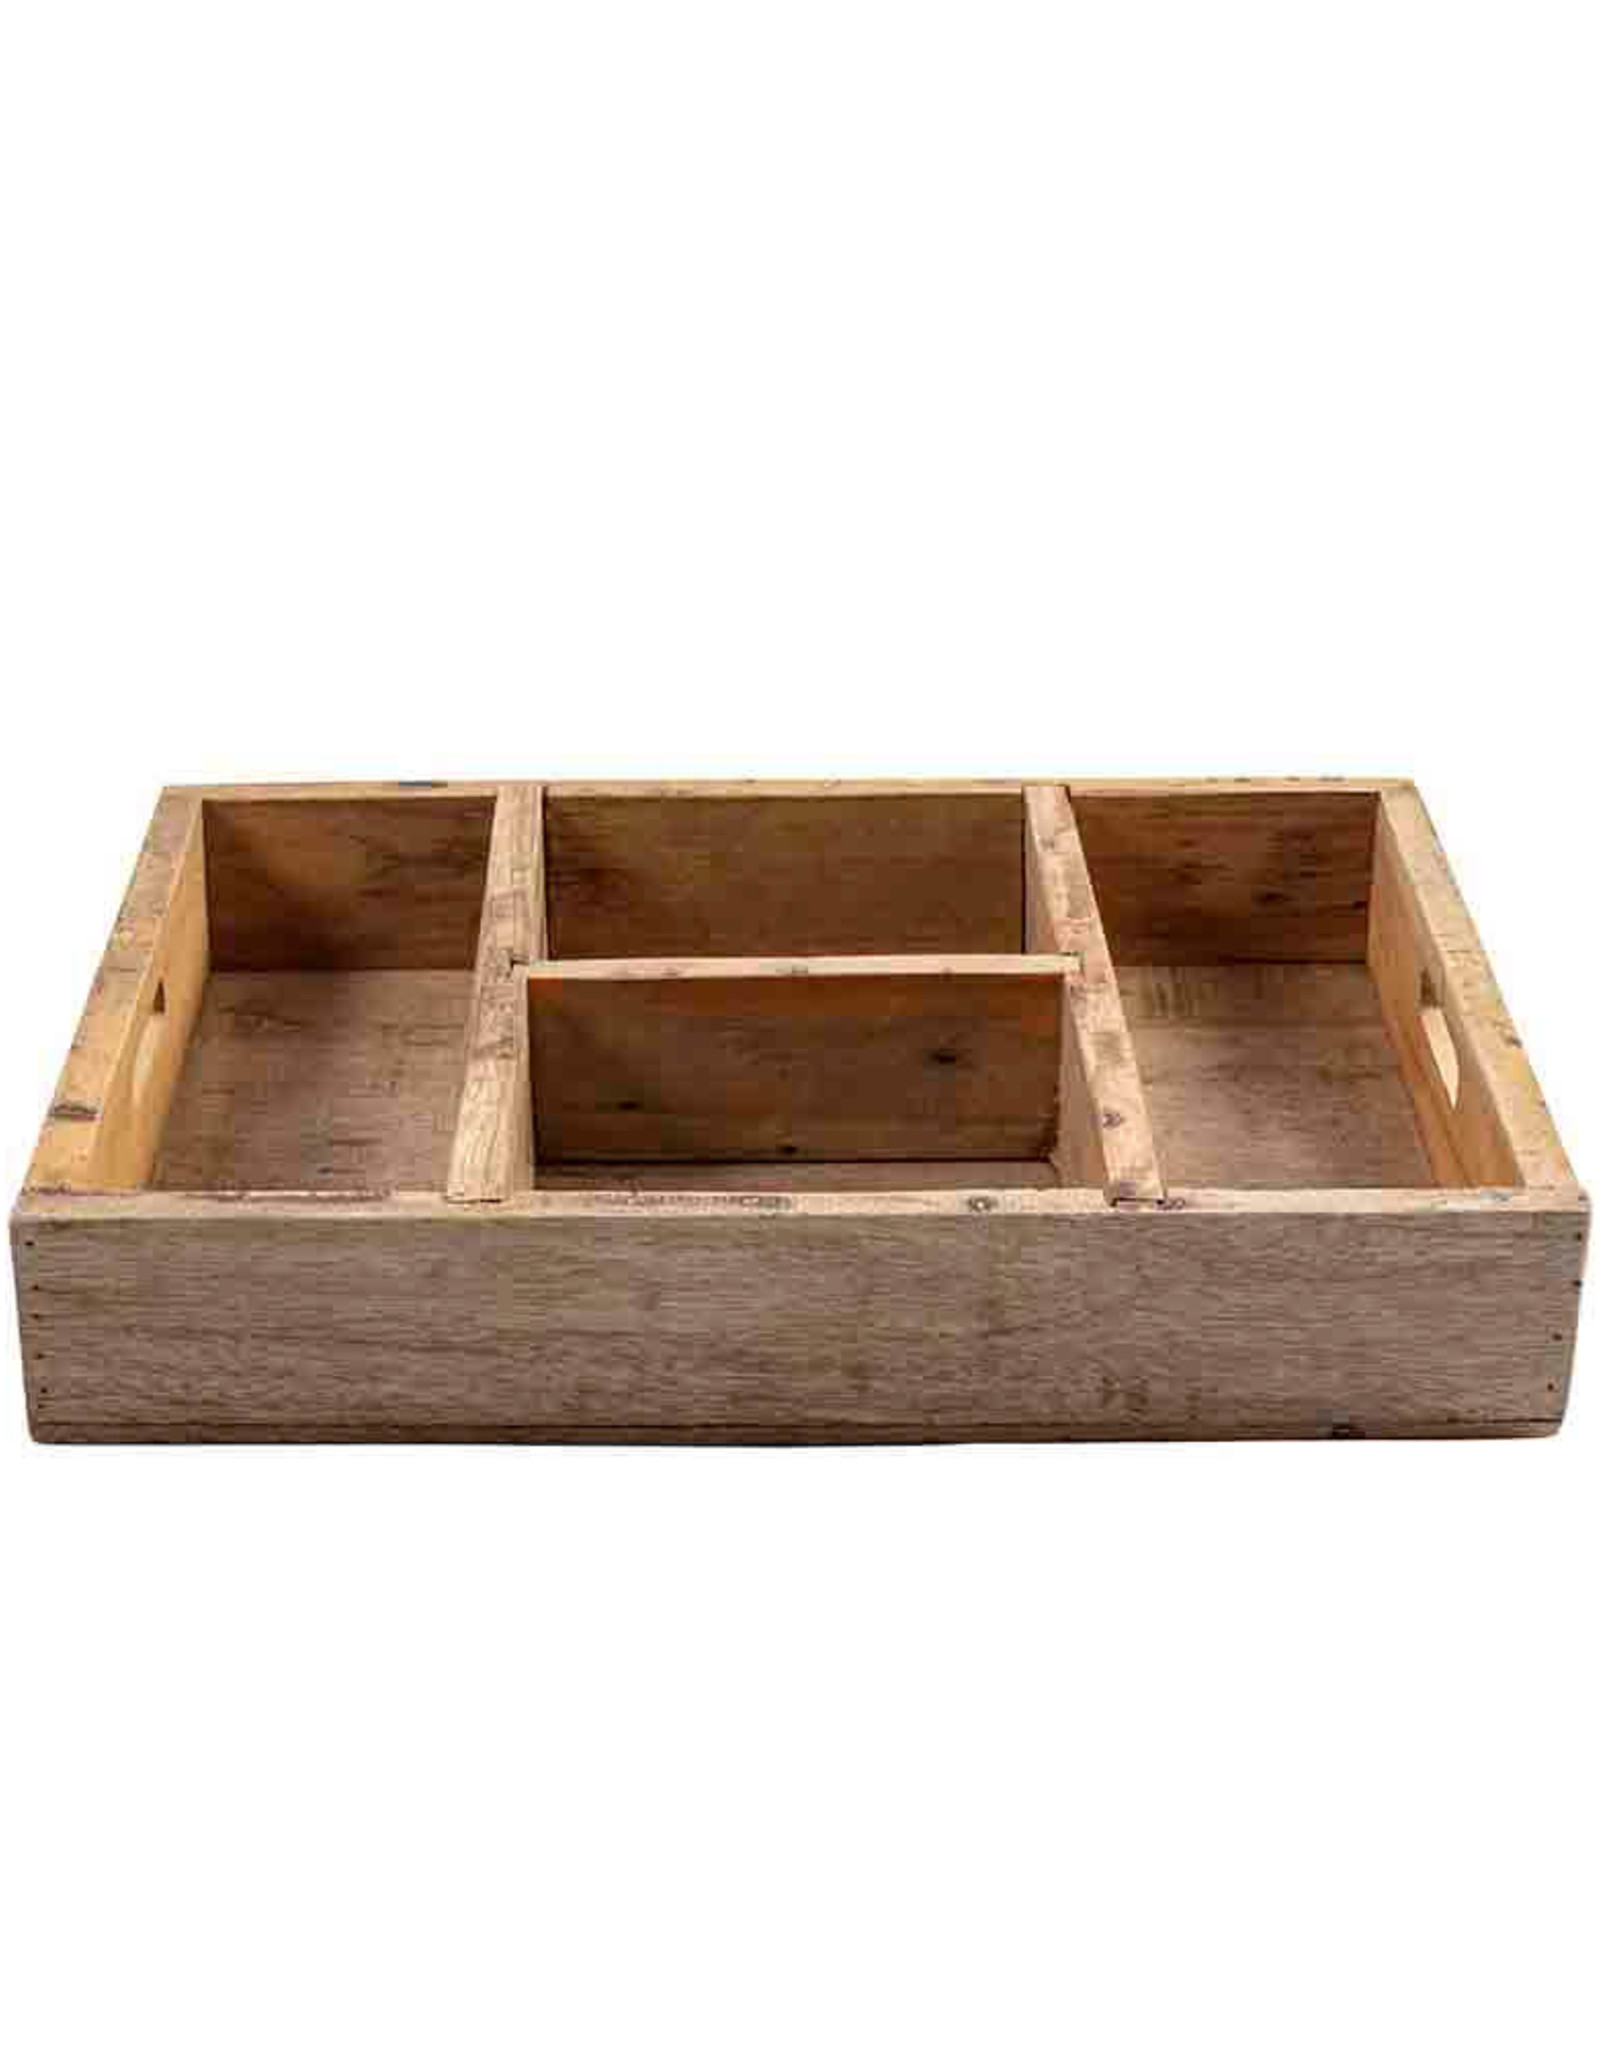 Original  Home Opberger gerecycleerd hout